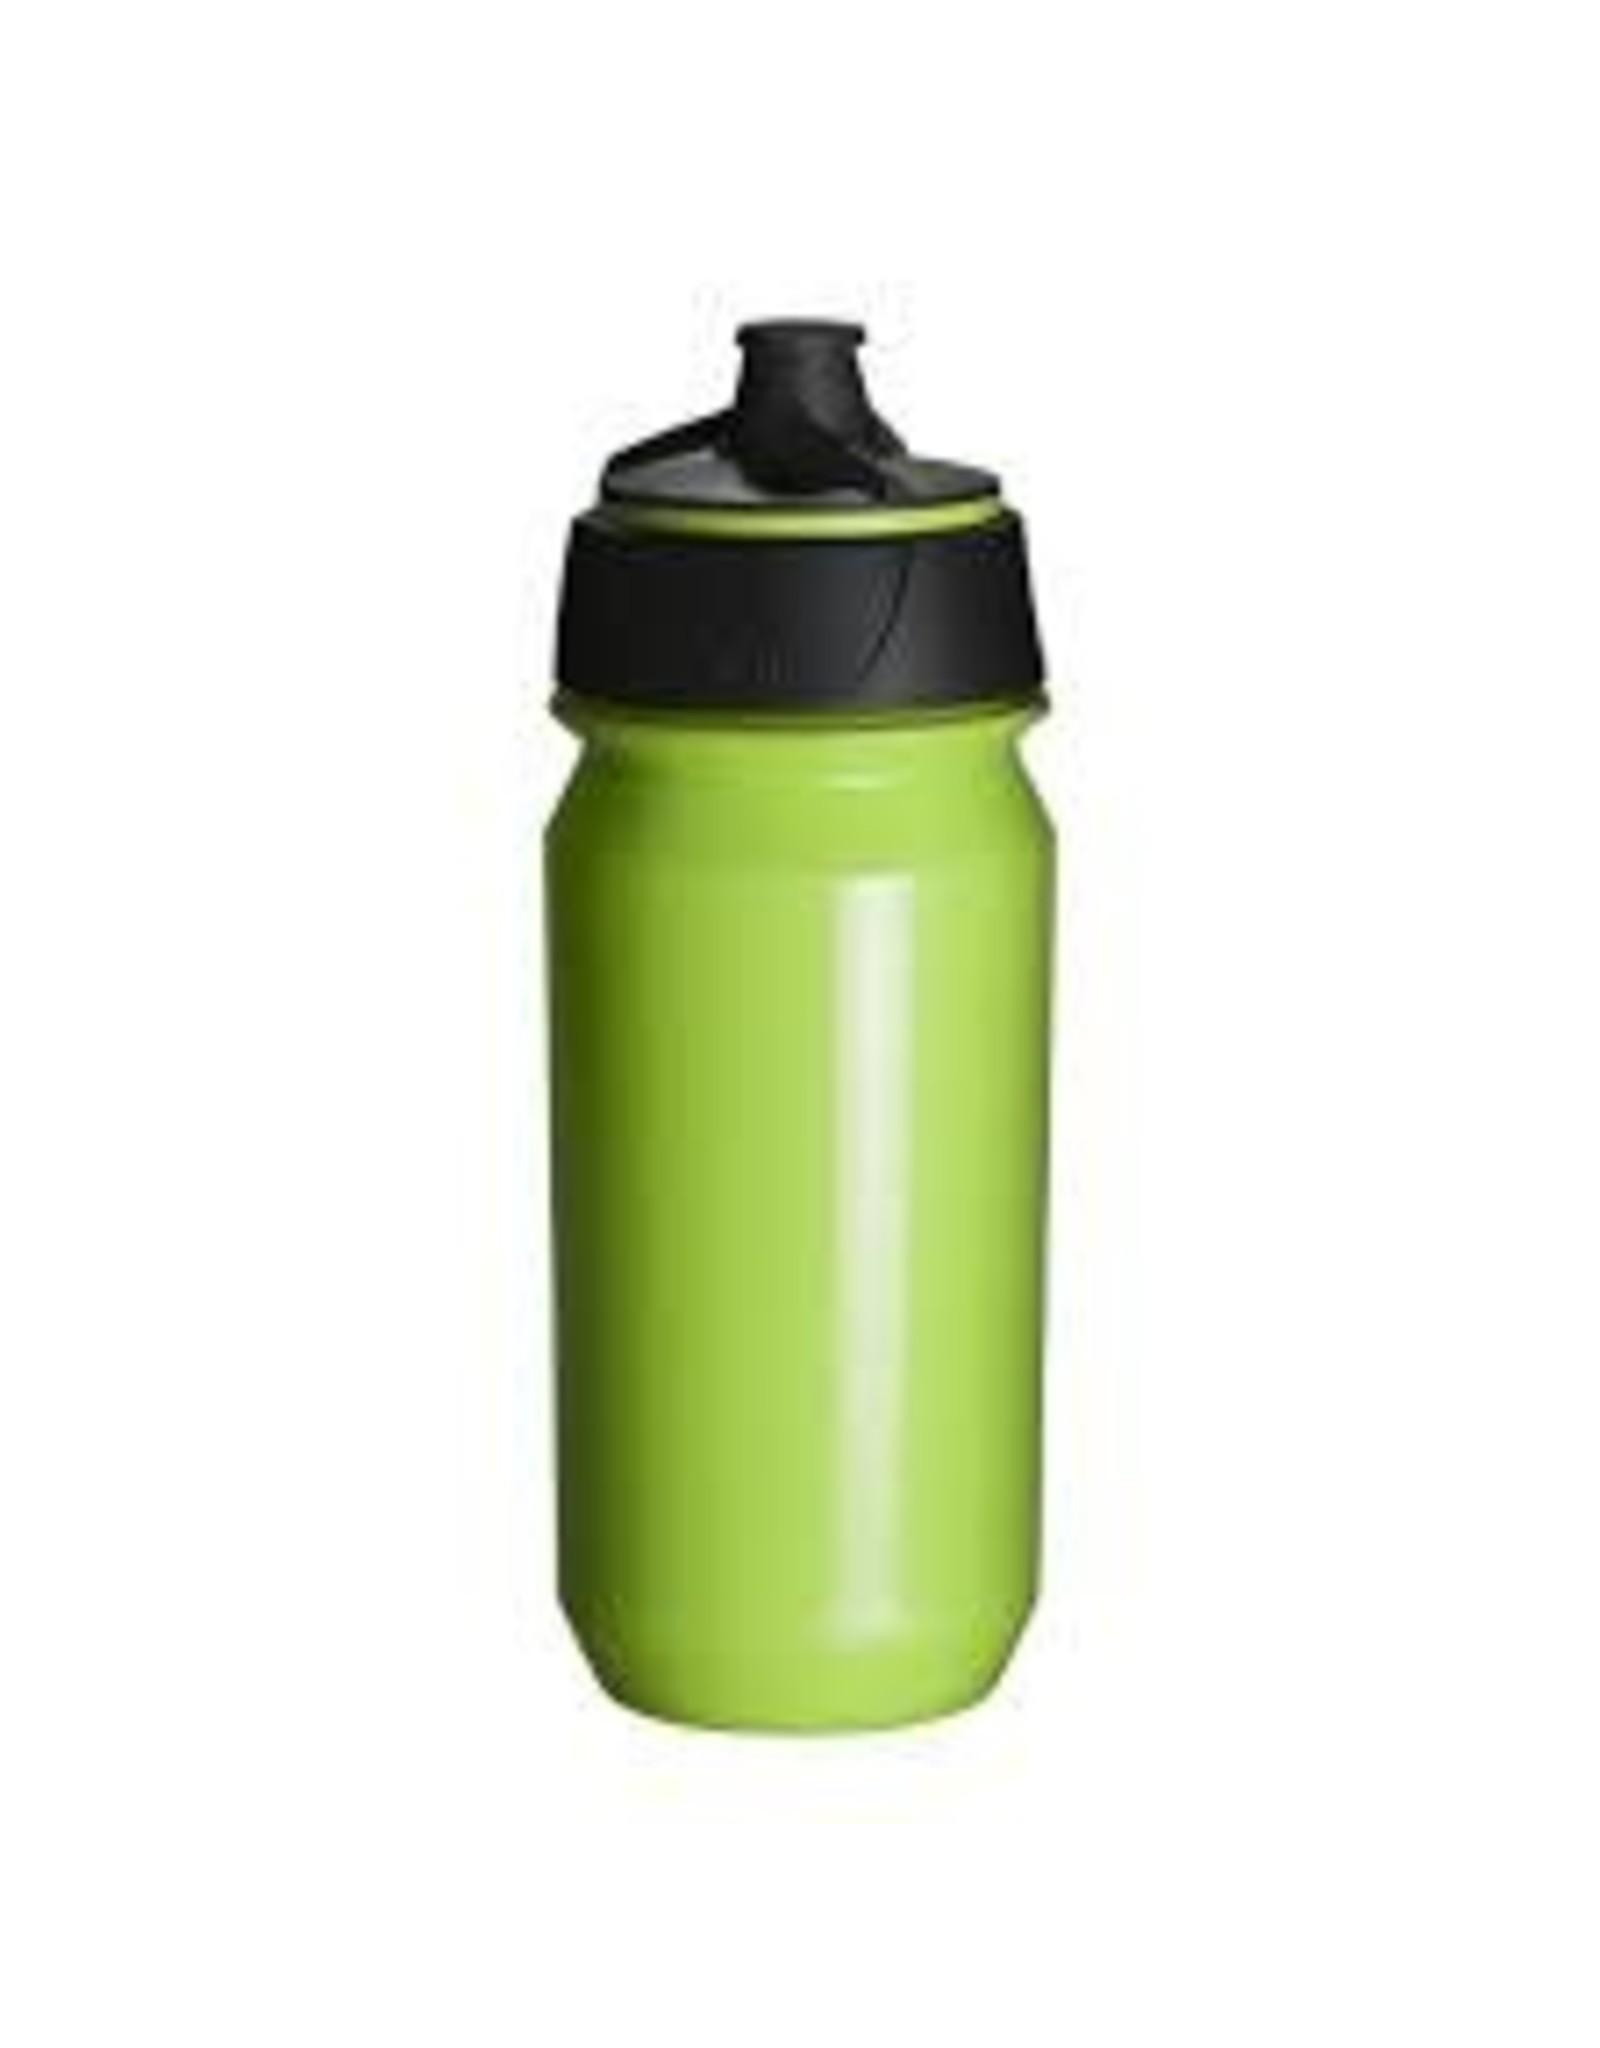 TACX Tacx, Shanti, Bottle, 500ml, Green